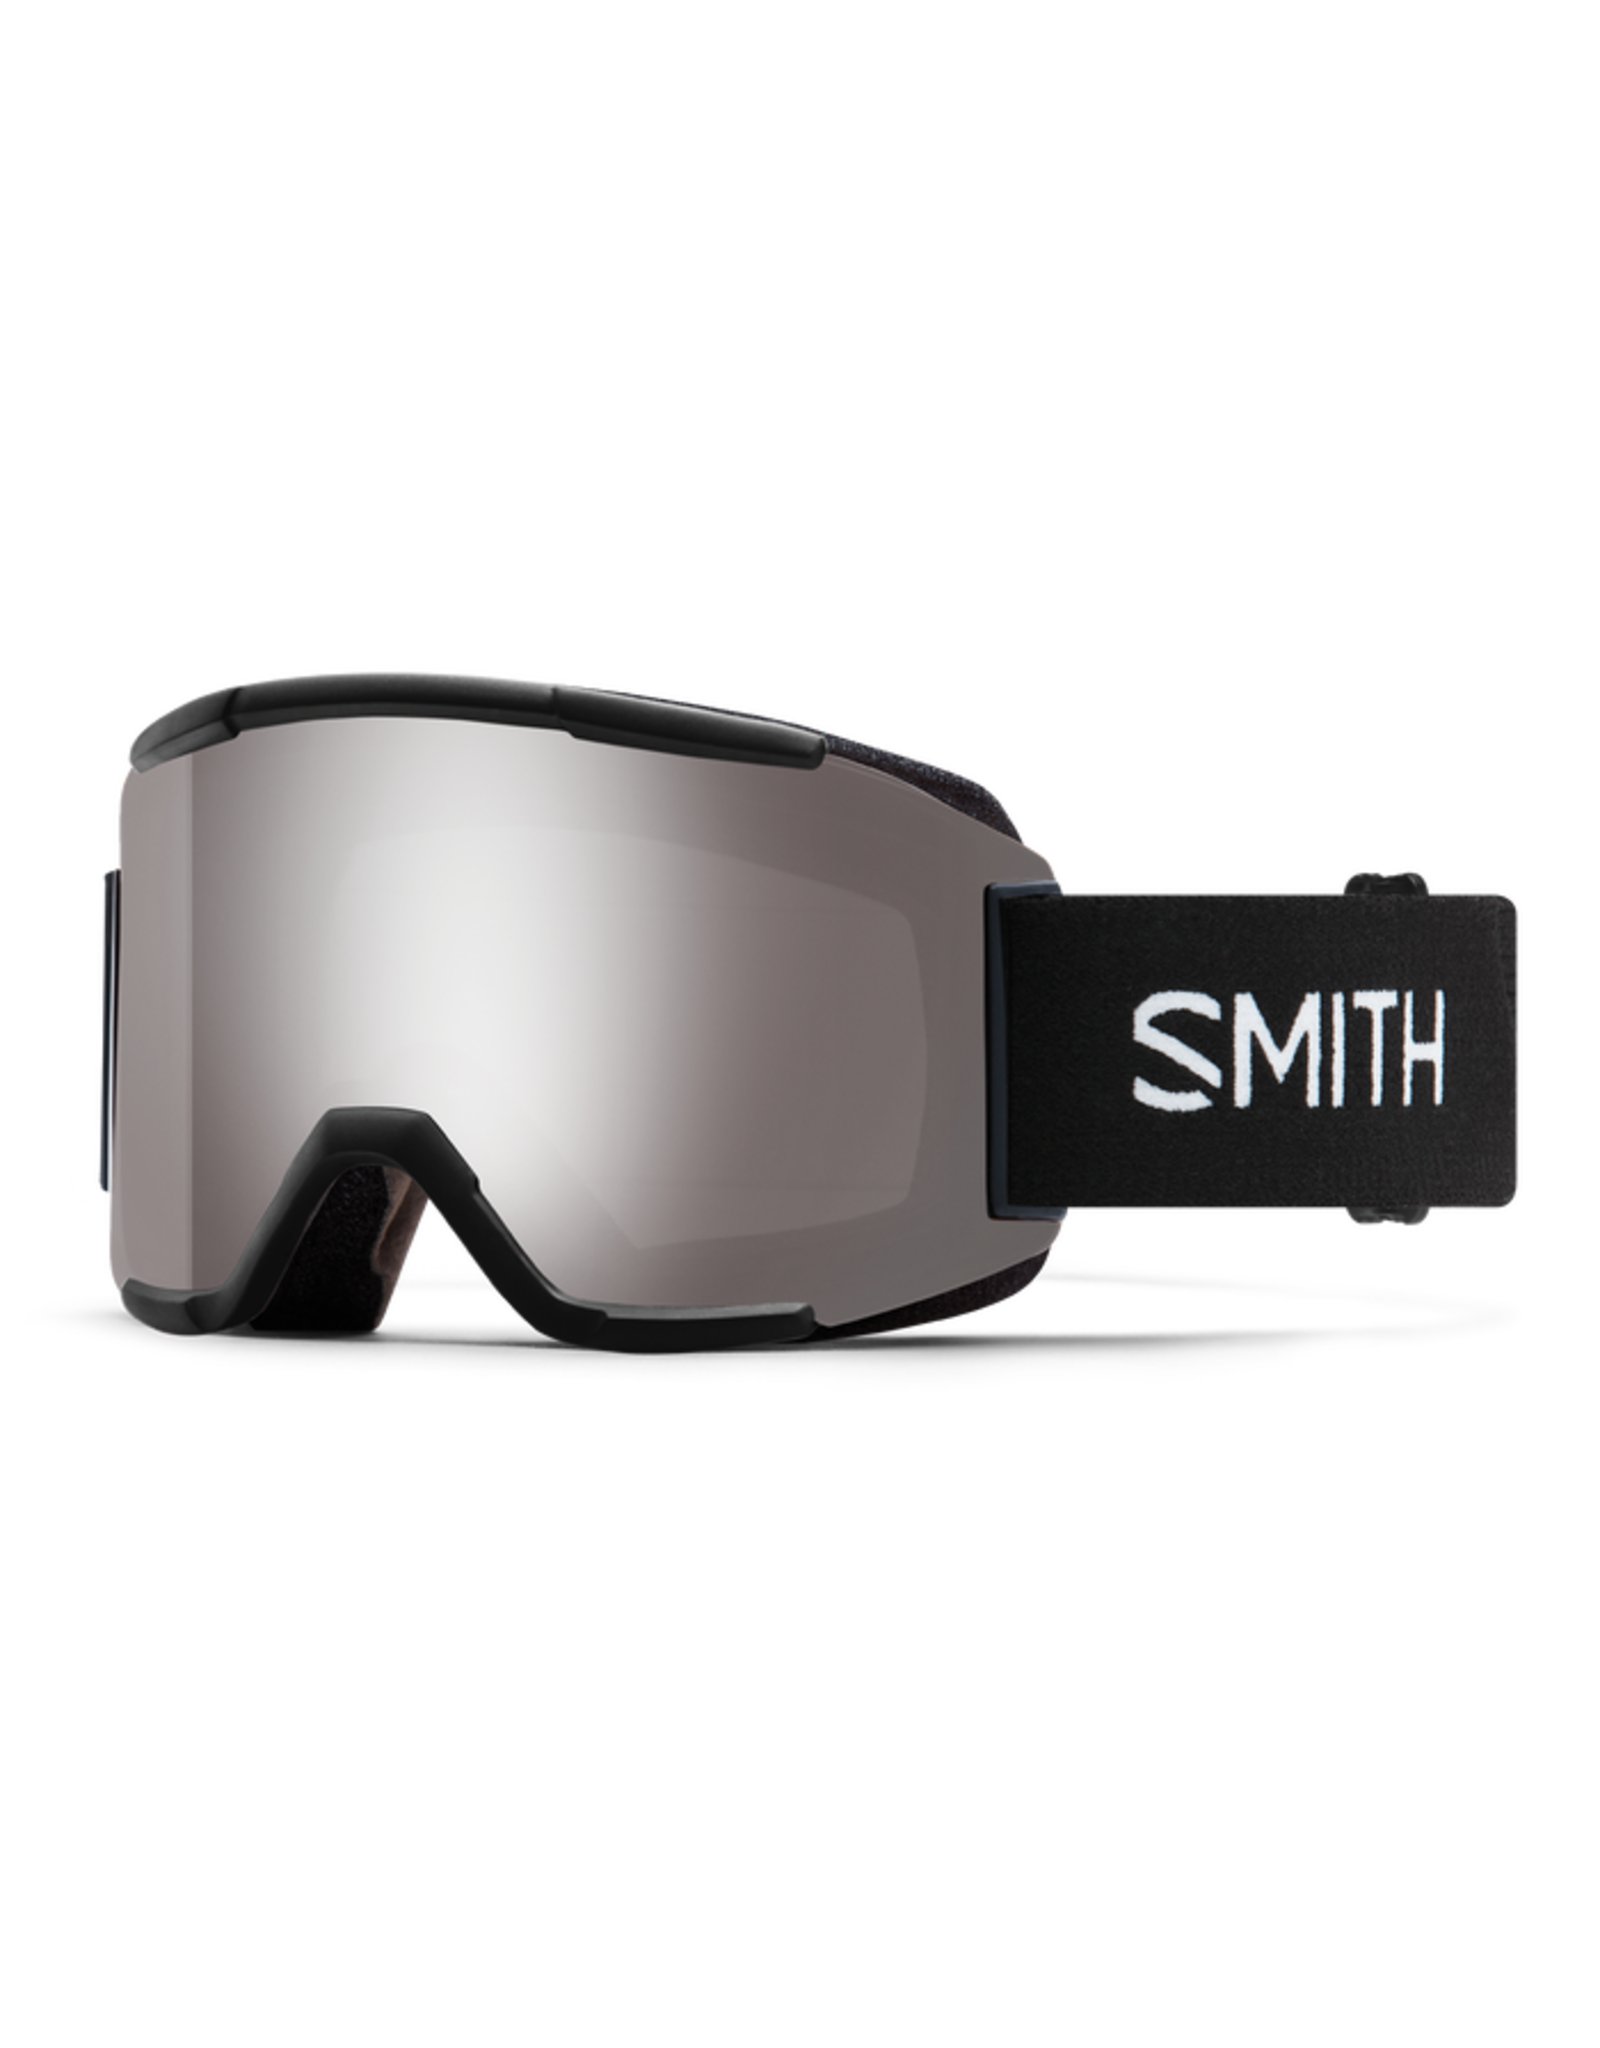 smith optics Smith Squad Goggles - Chromapop Sun Platinum Mirror - Black